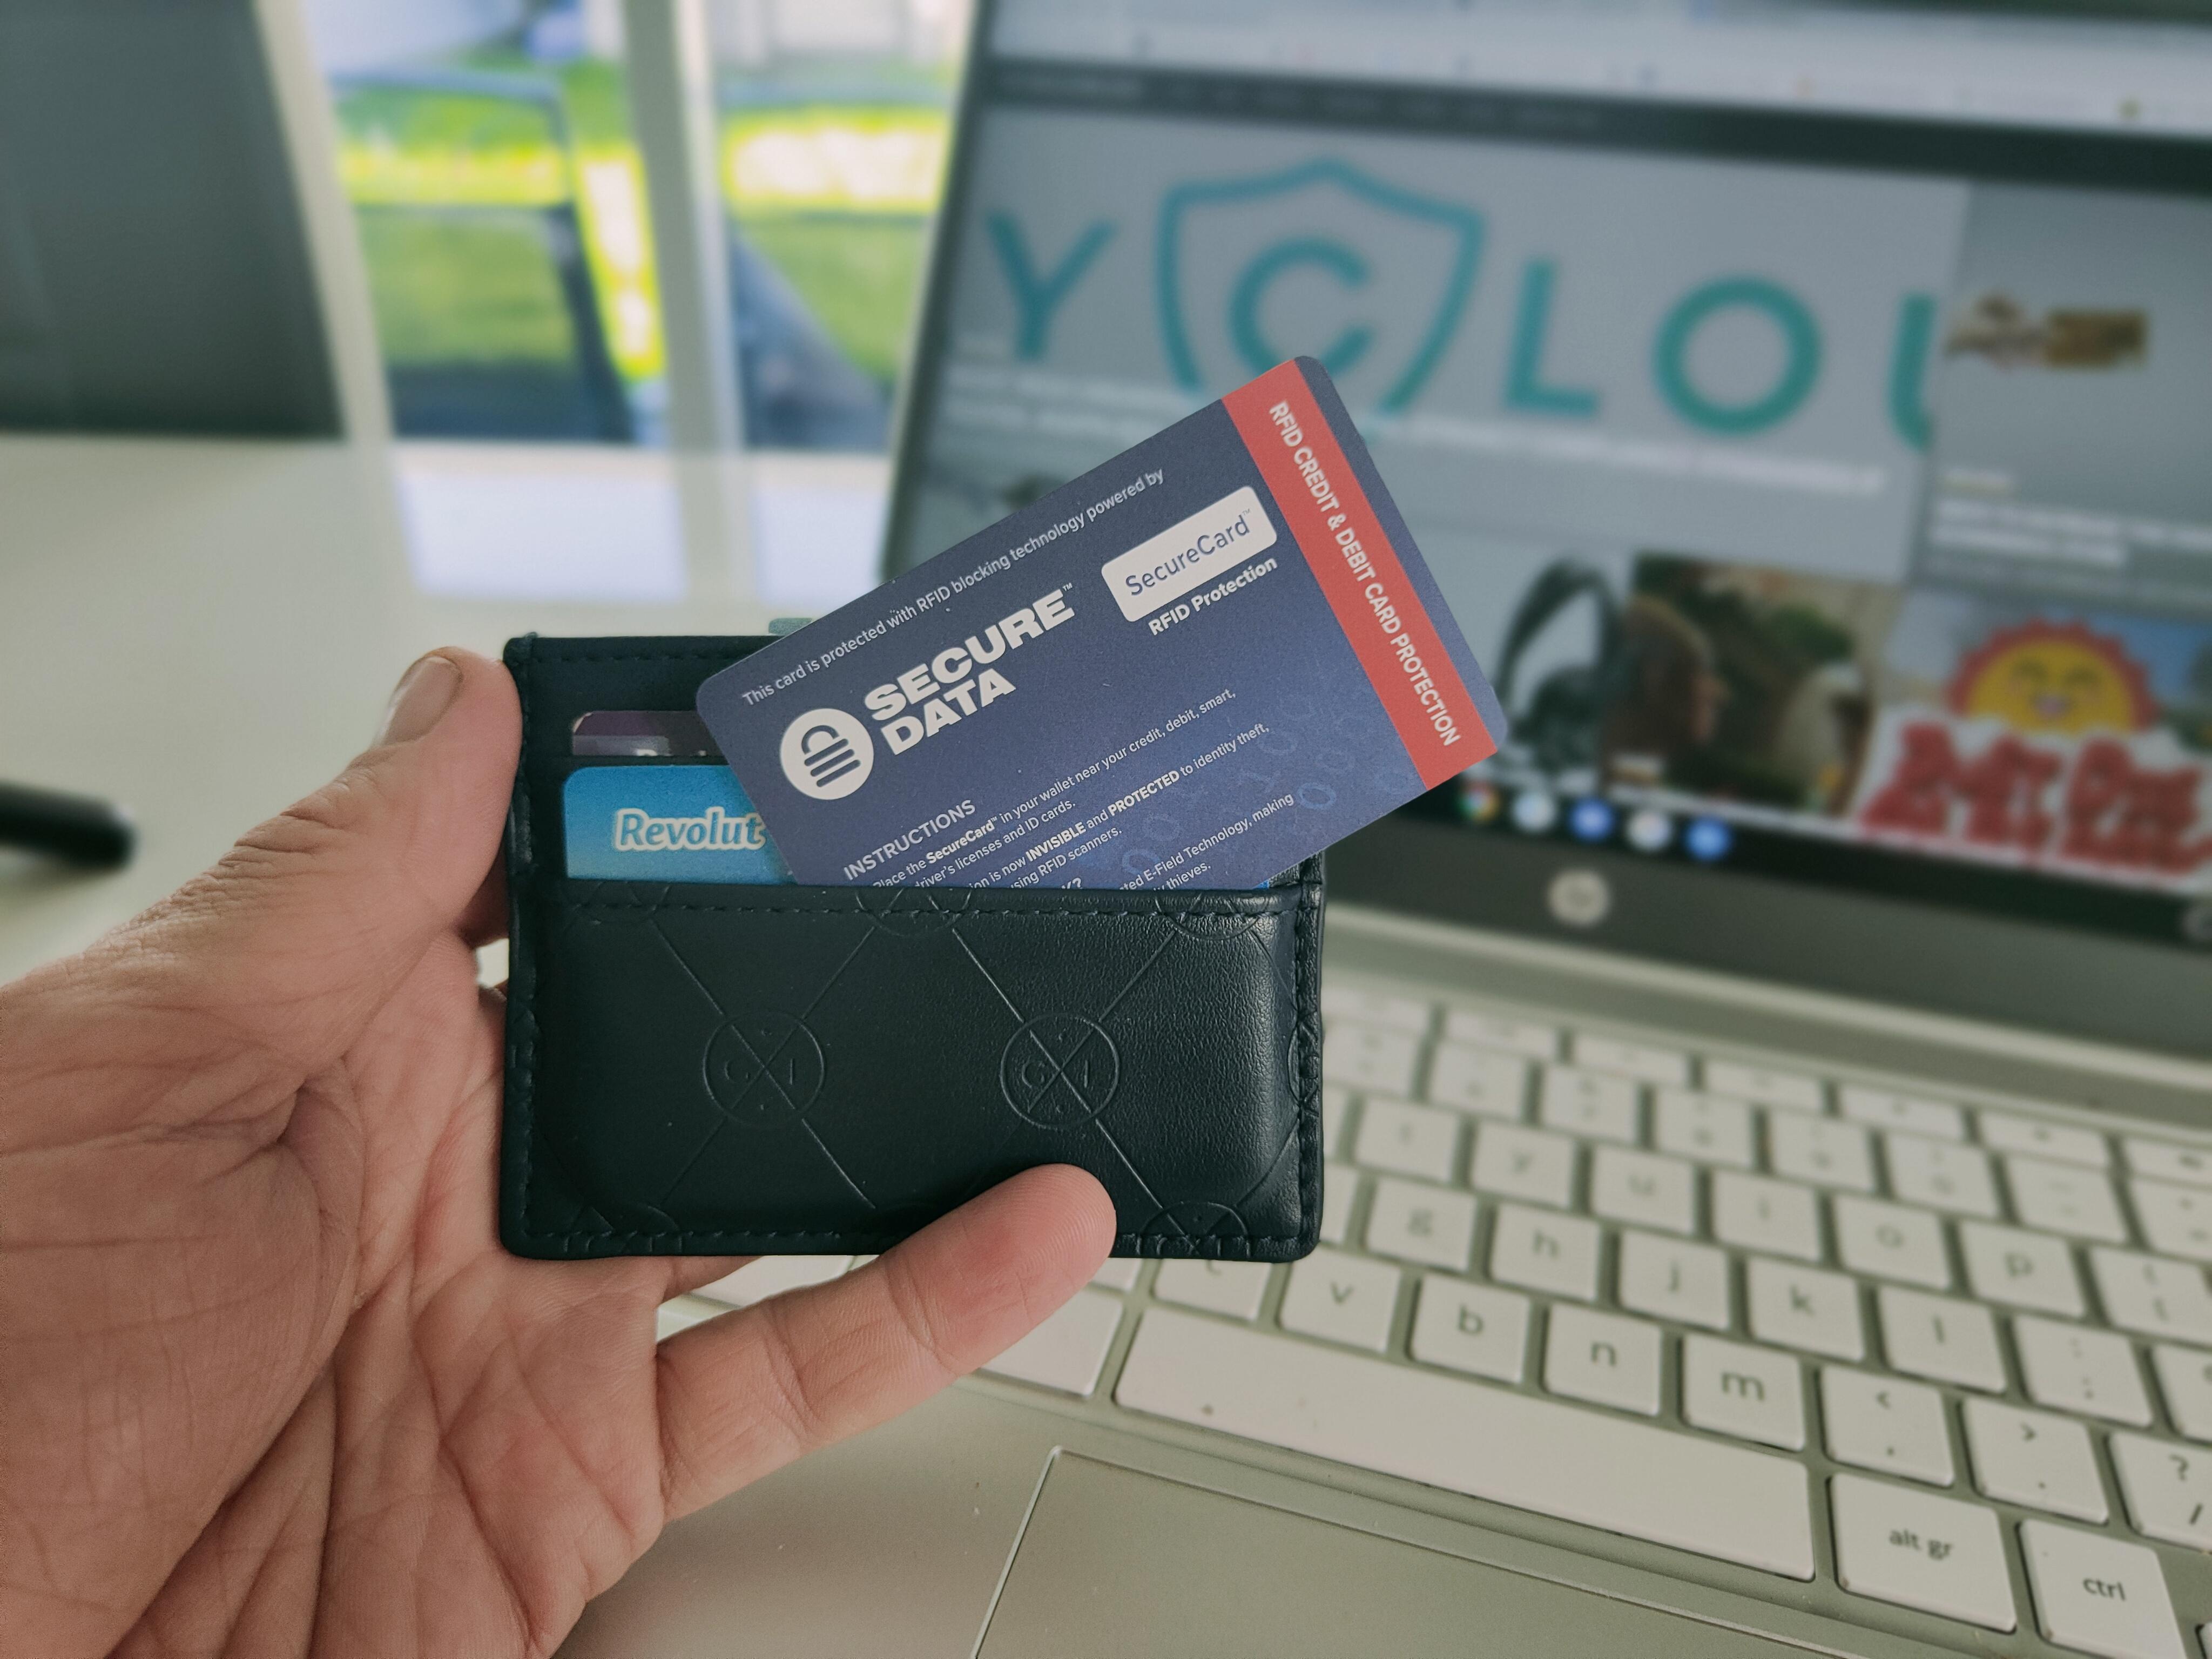 secure data secure card techbuzzireland